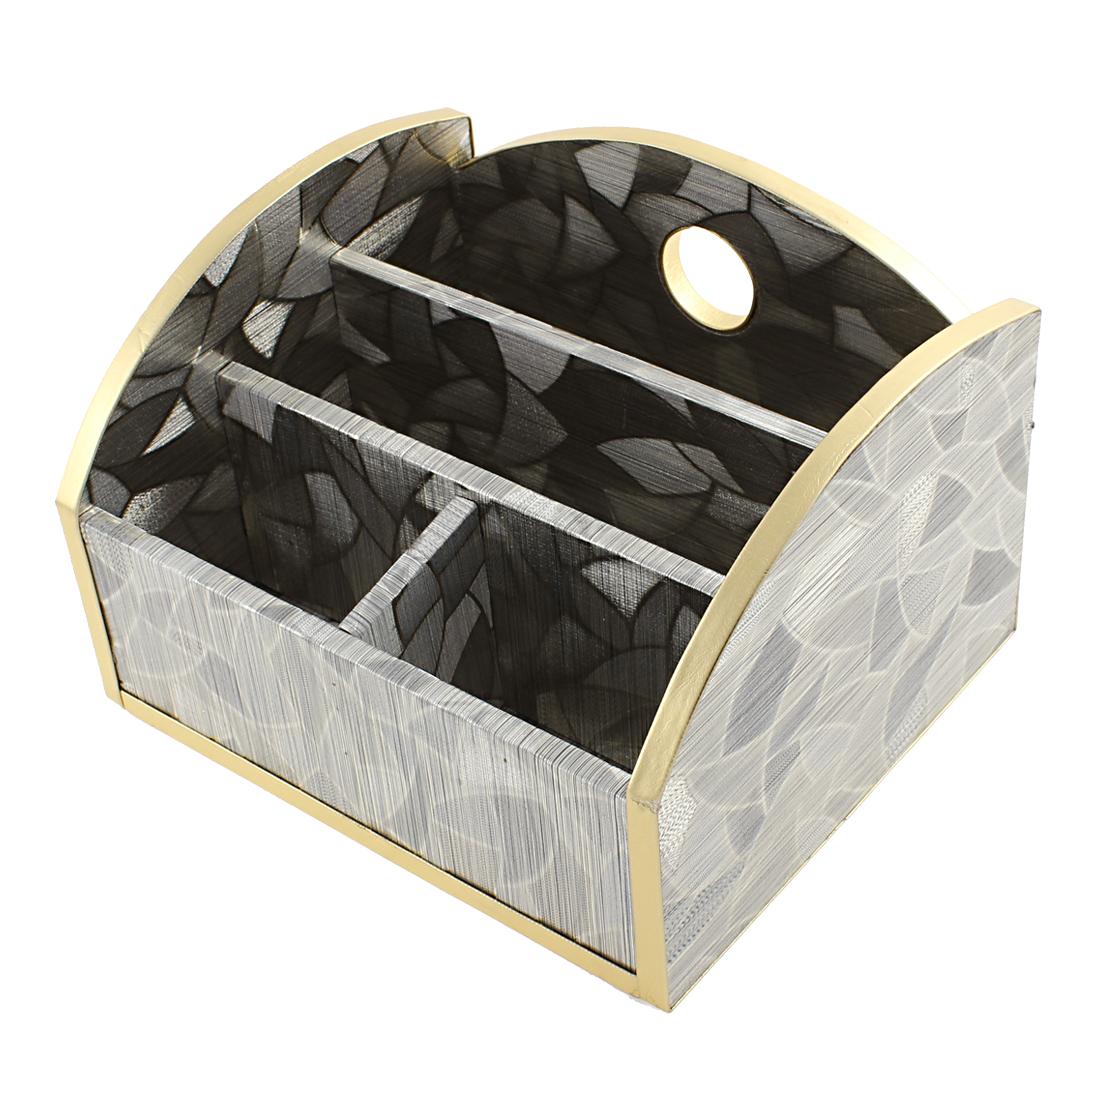 Gradient Silver Tone Irregular Shape Pattern Universal 4 Slot Wooden Storage Box